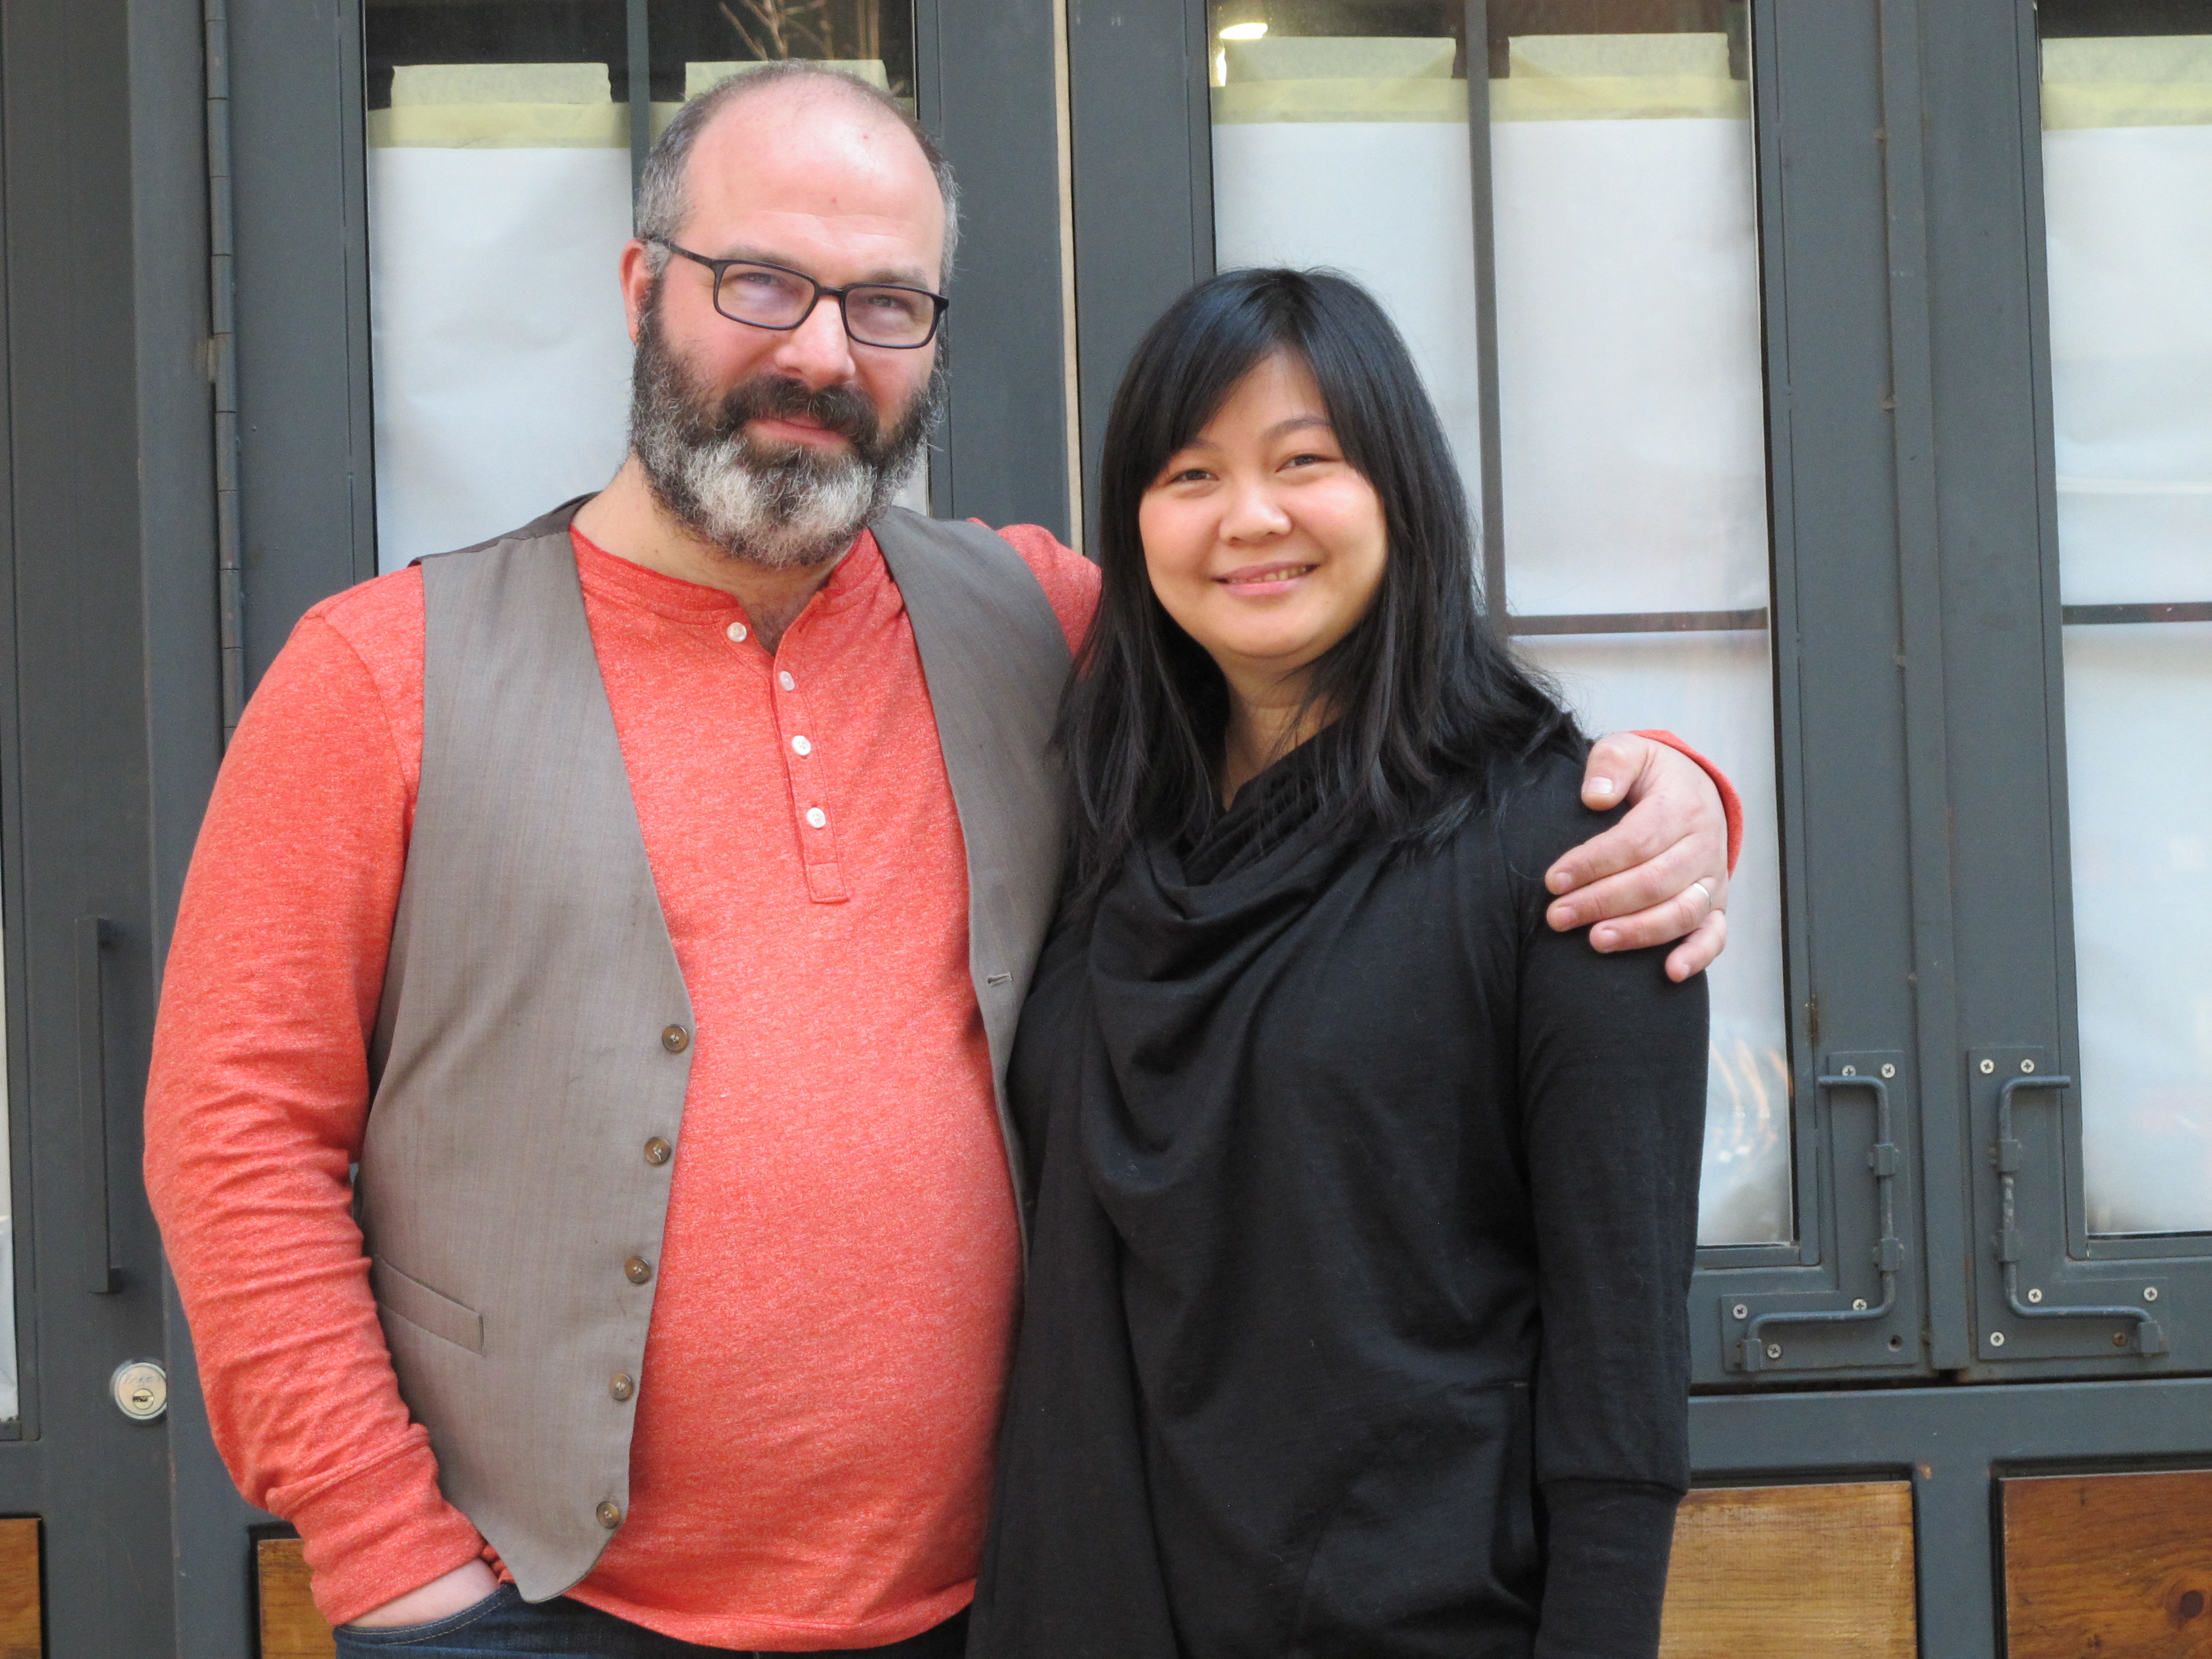 Ben Sandler and Jennifer Lim outside of Wassail